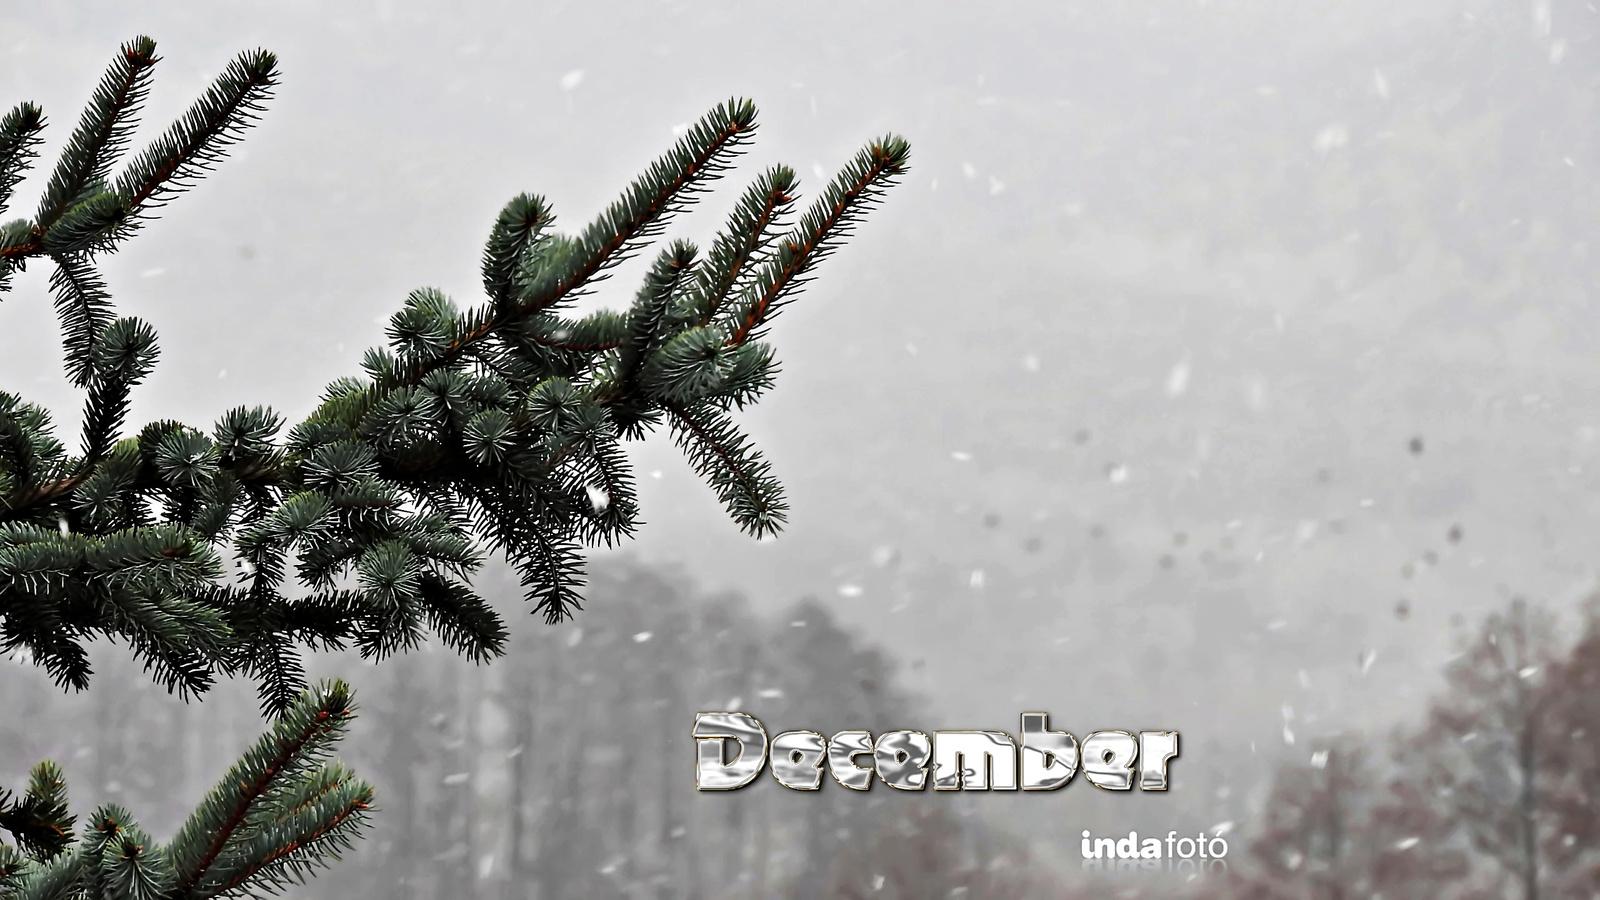 2560x1440 december.png